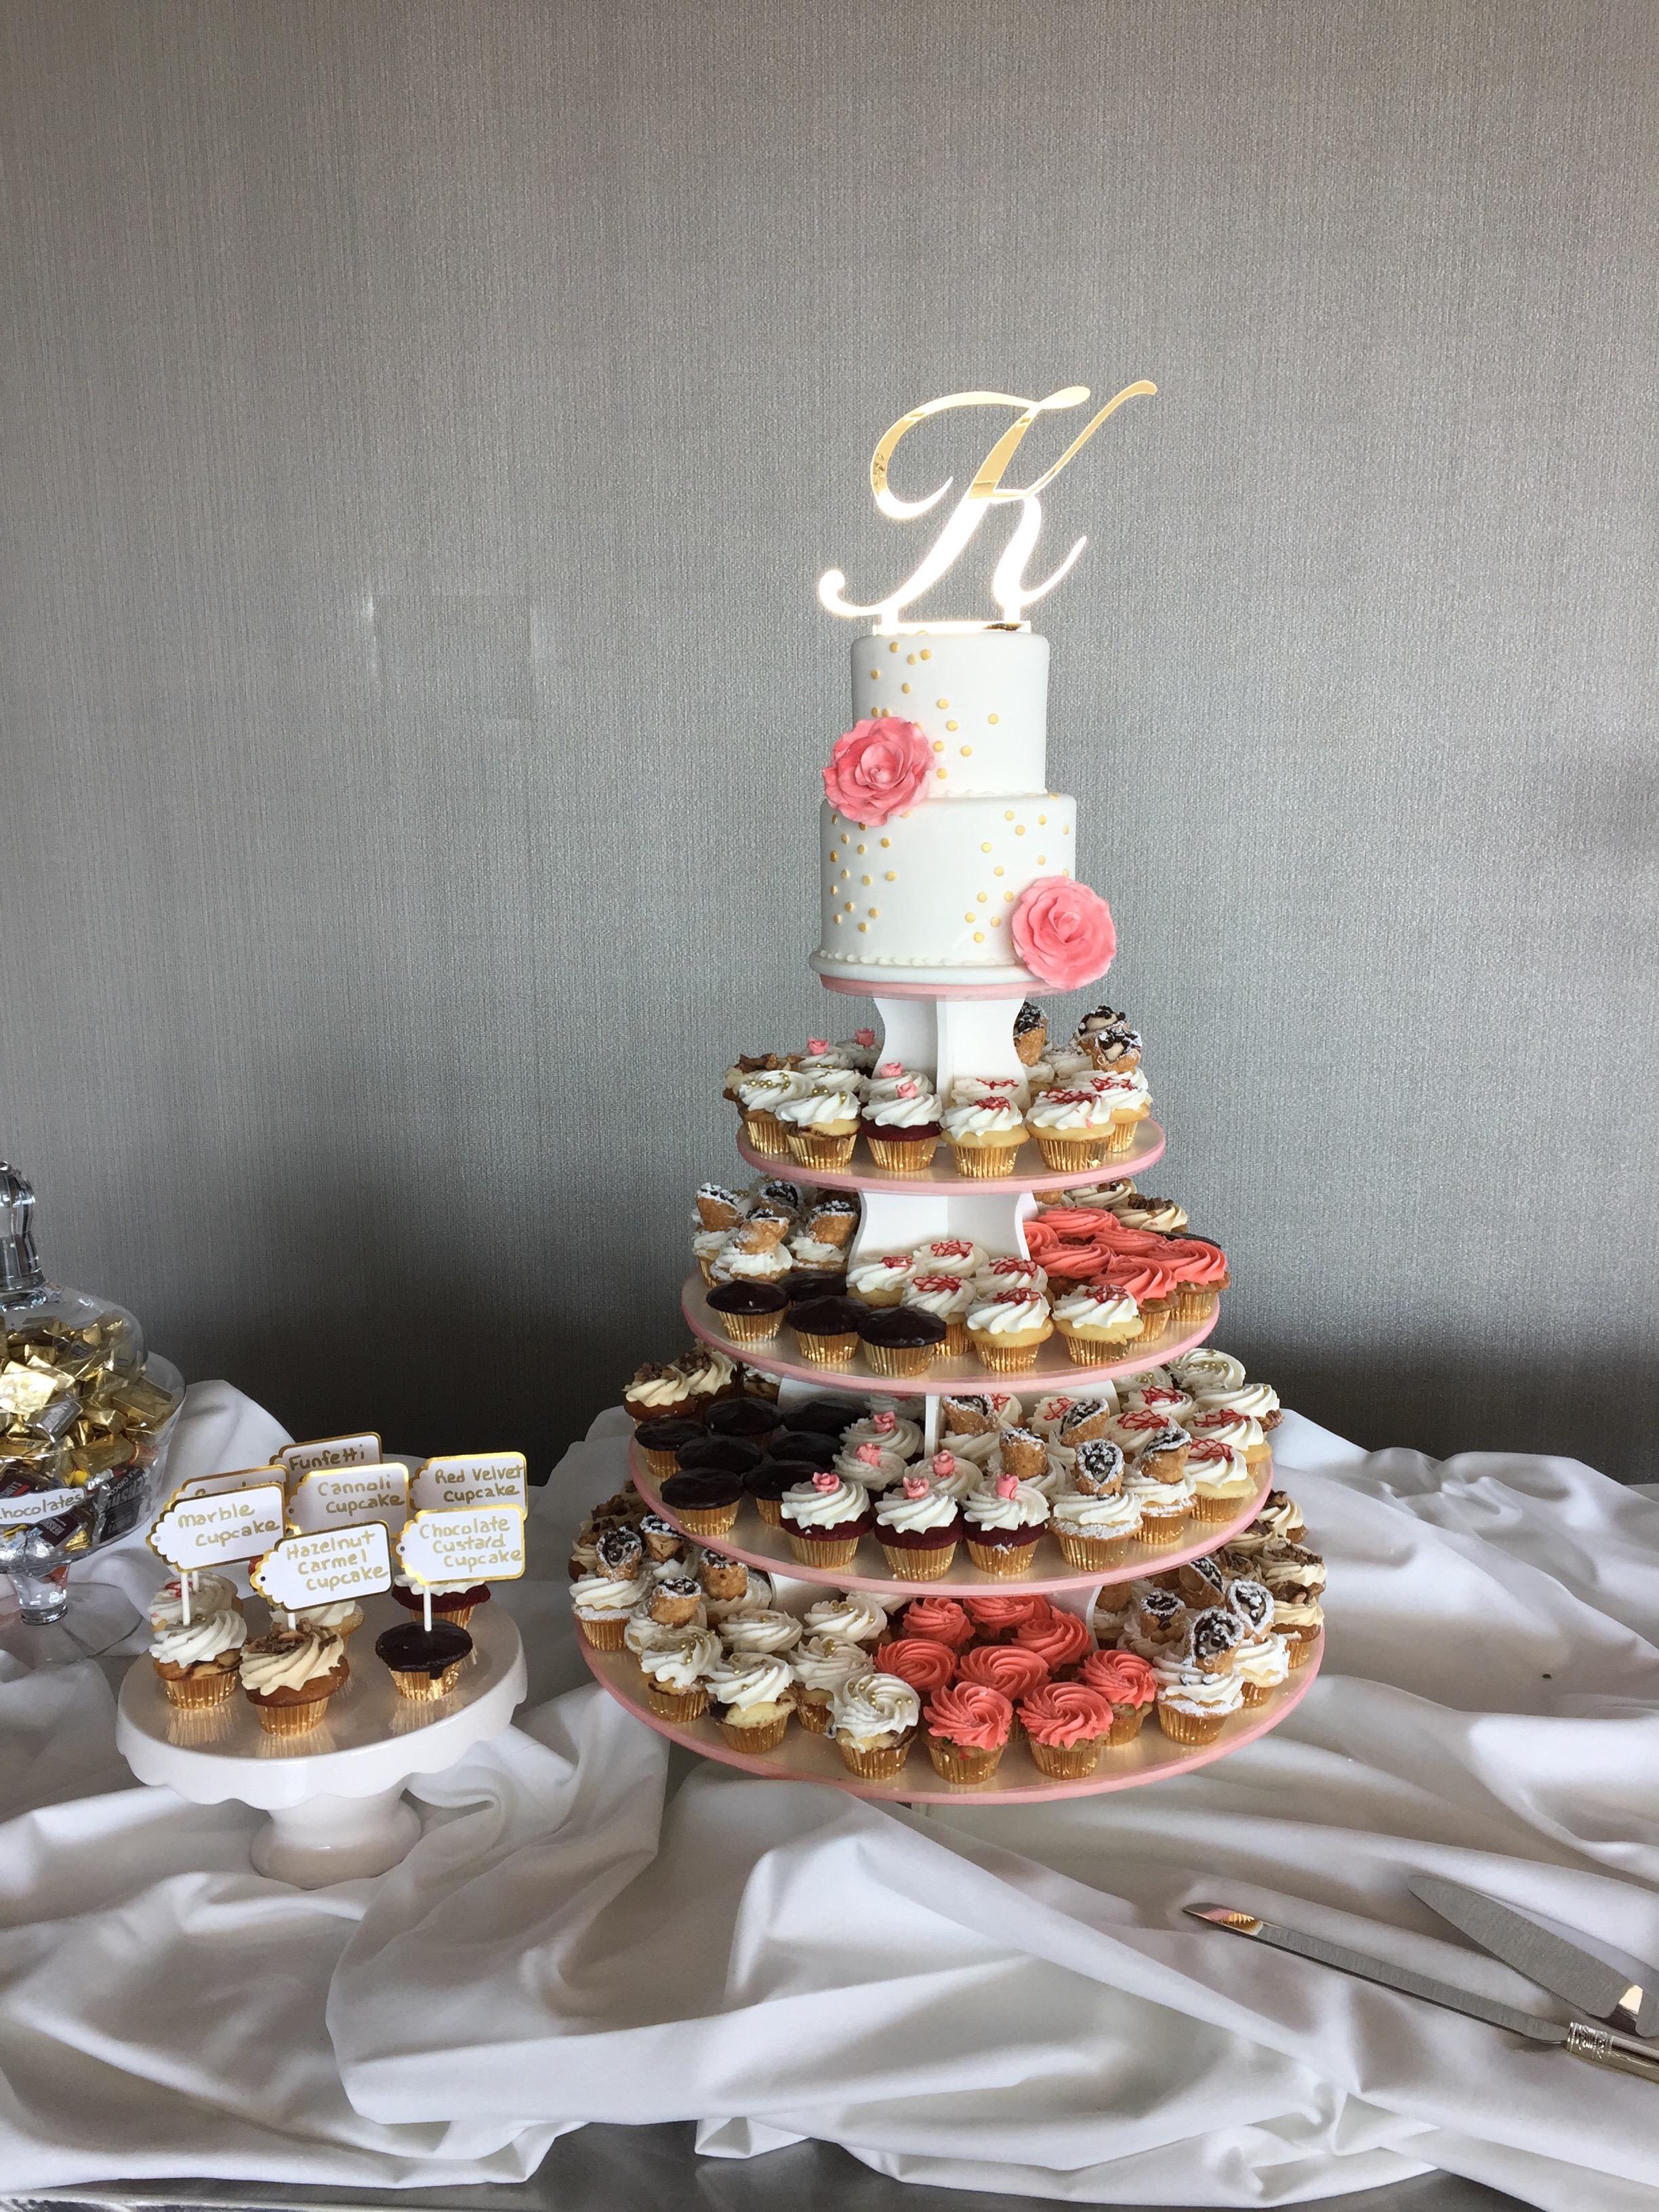 Wedding Cake wMiniCupcakes2 Display